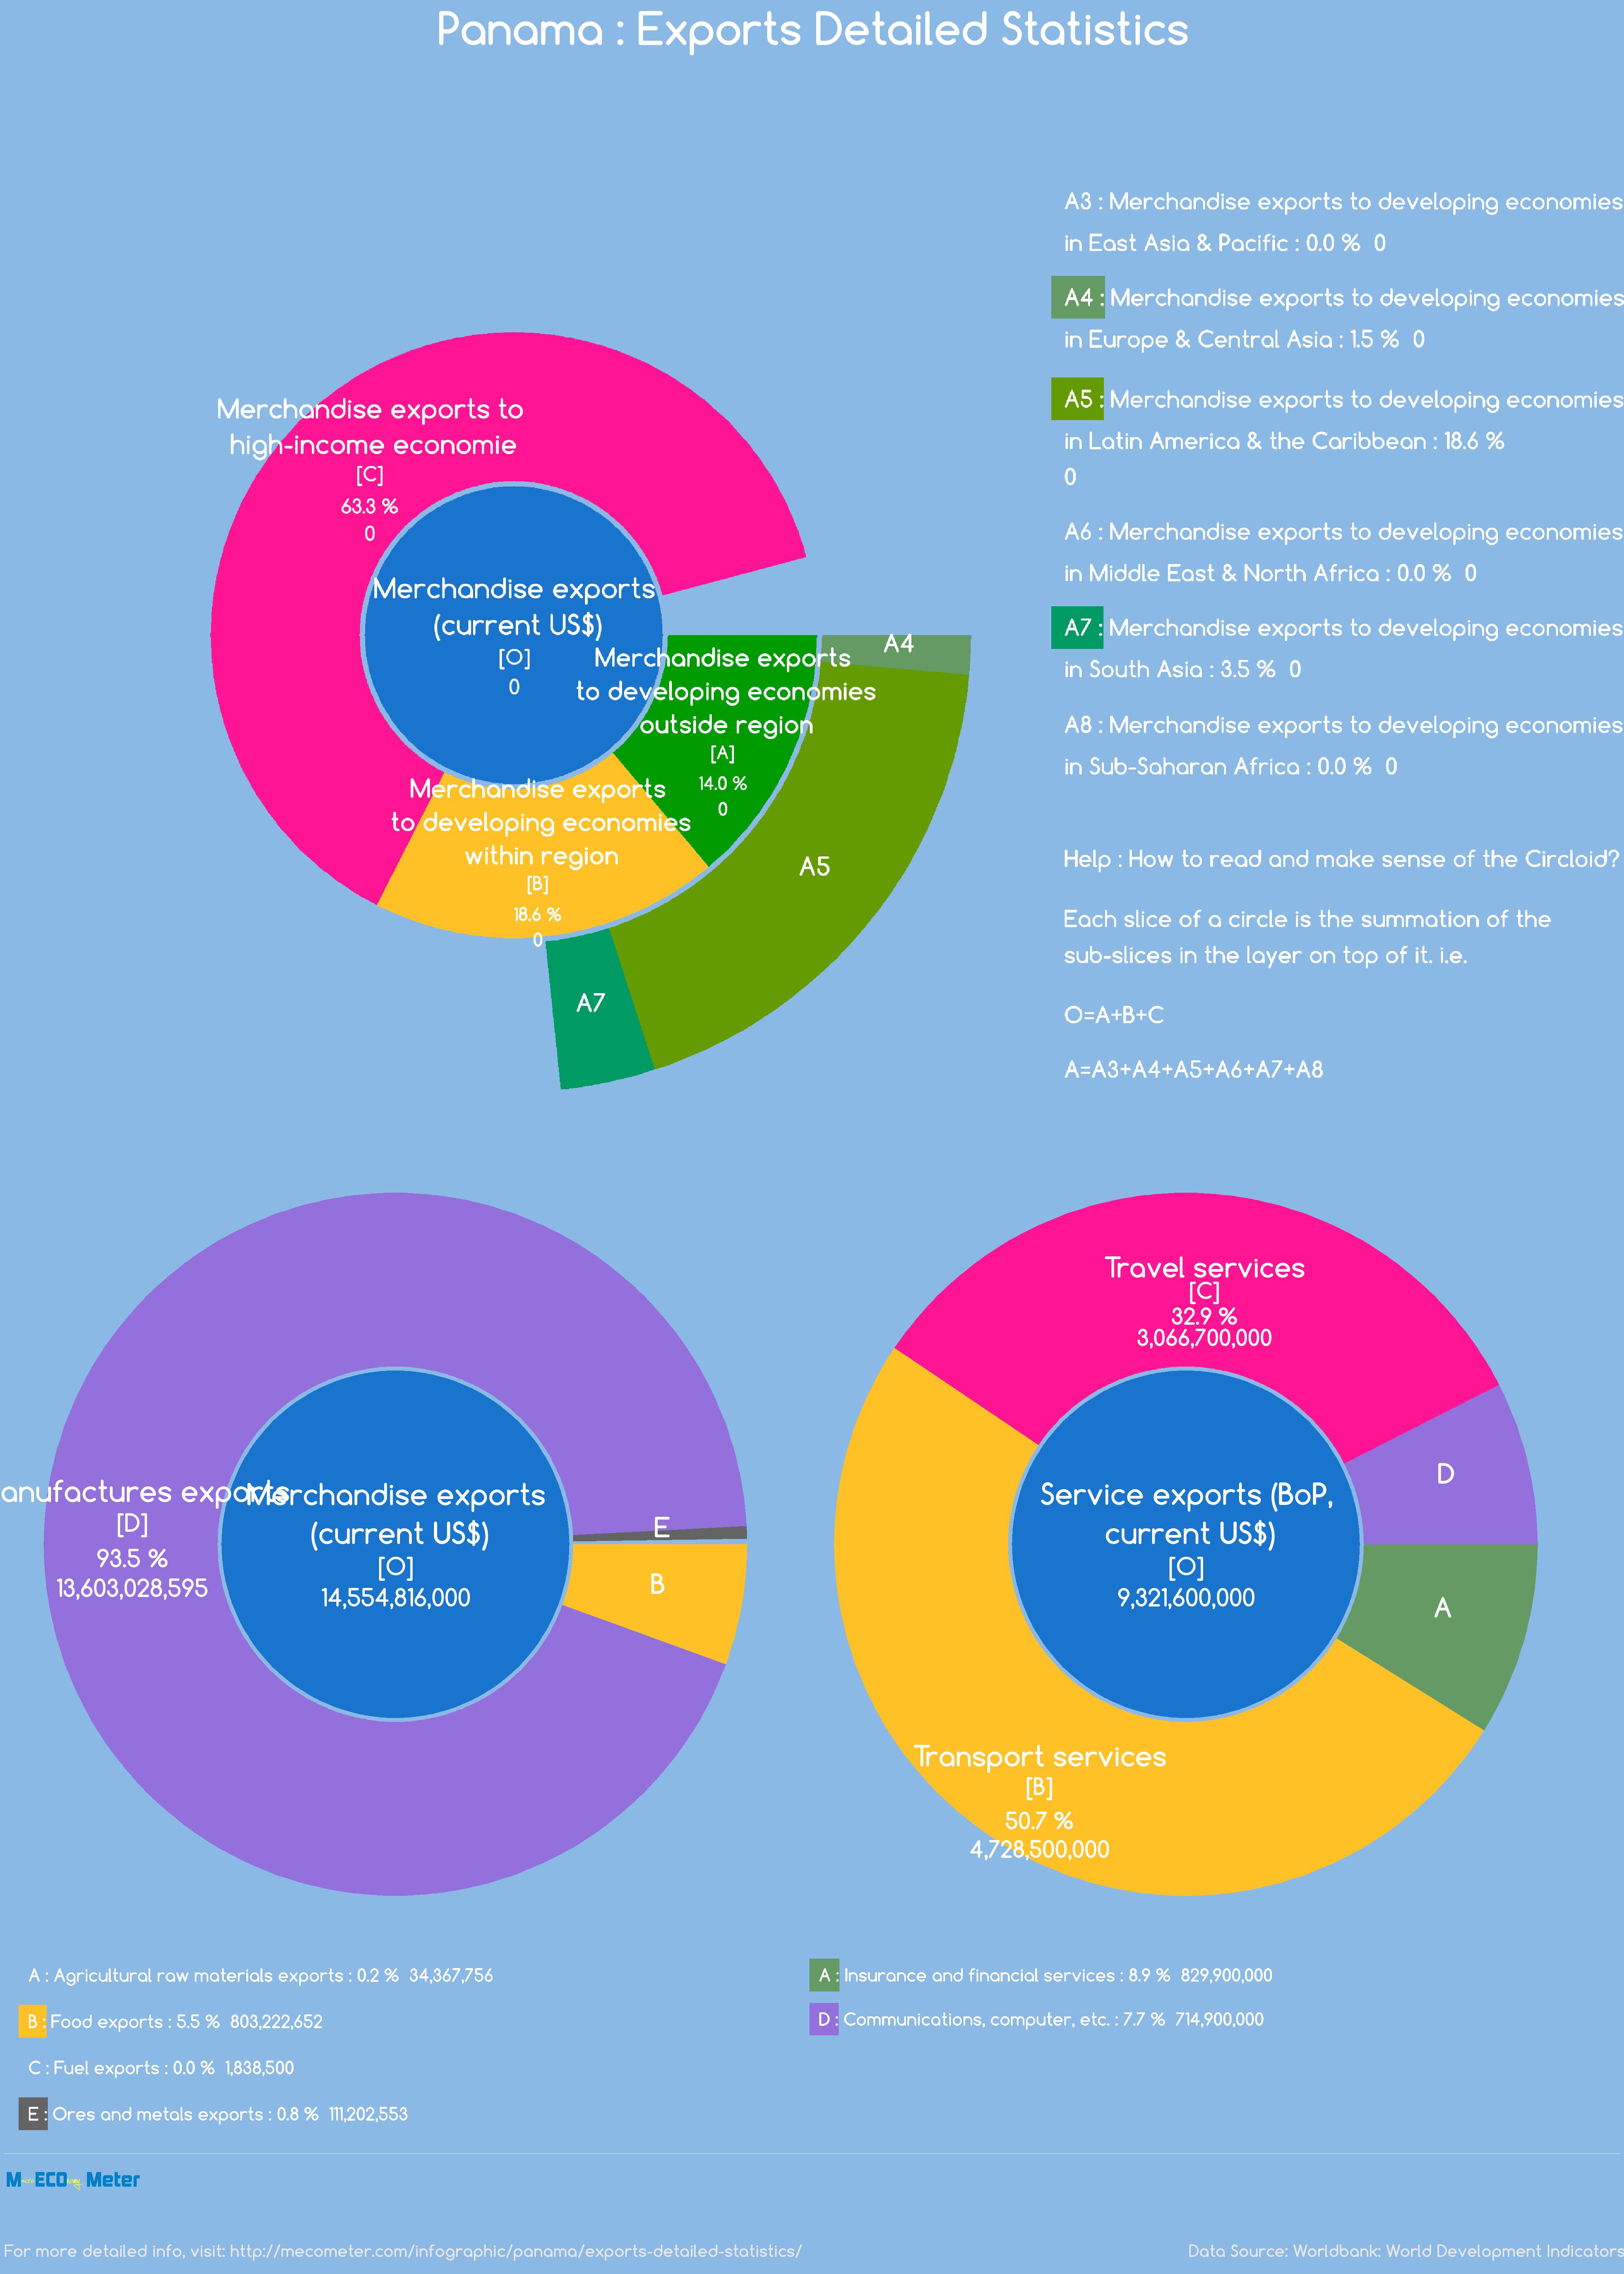 Panama : Exports Detailed Statistics